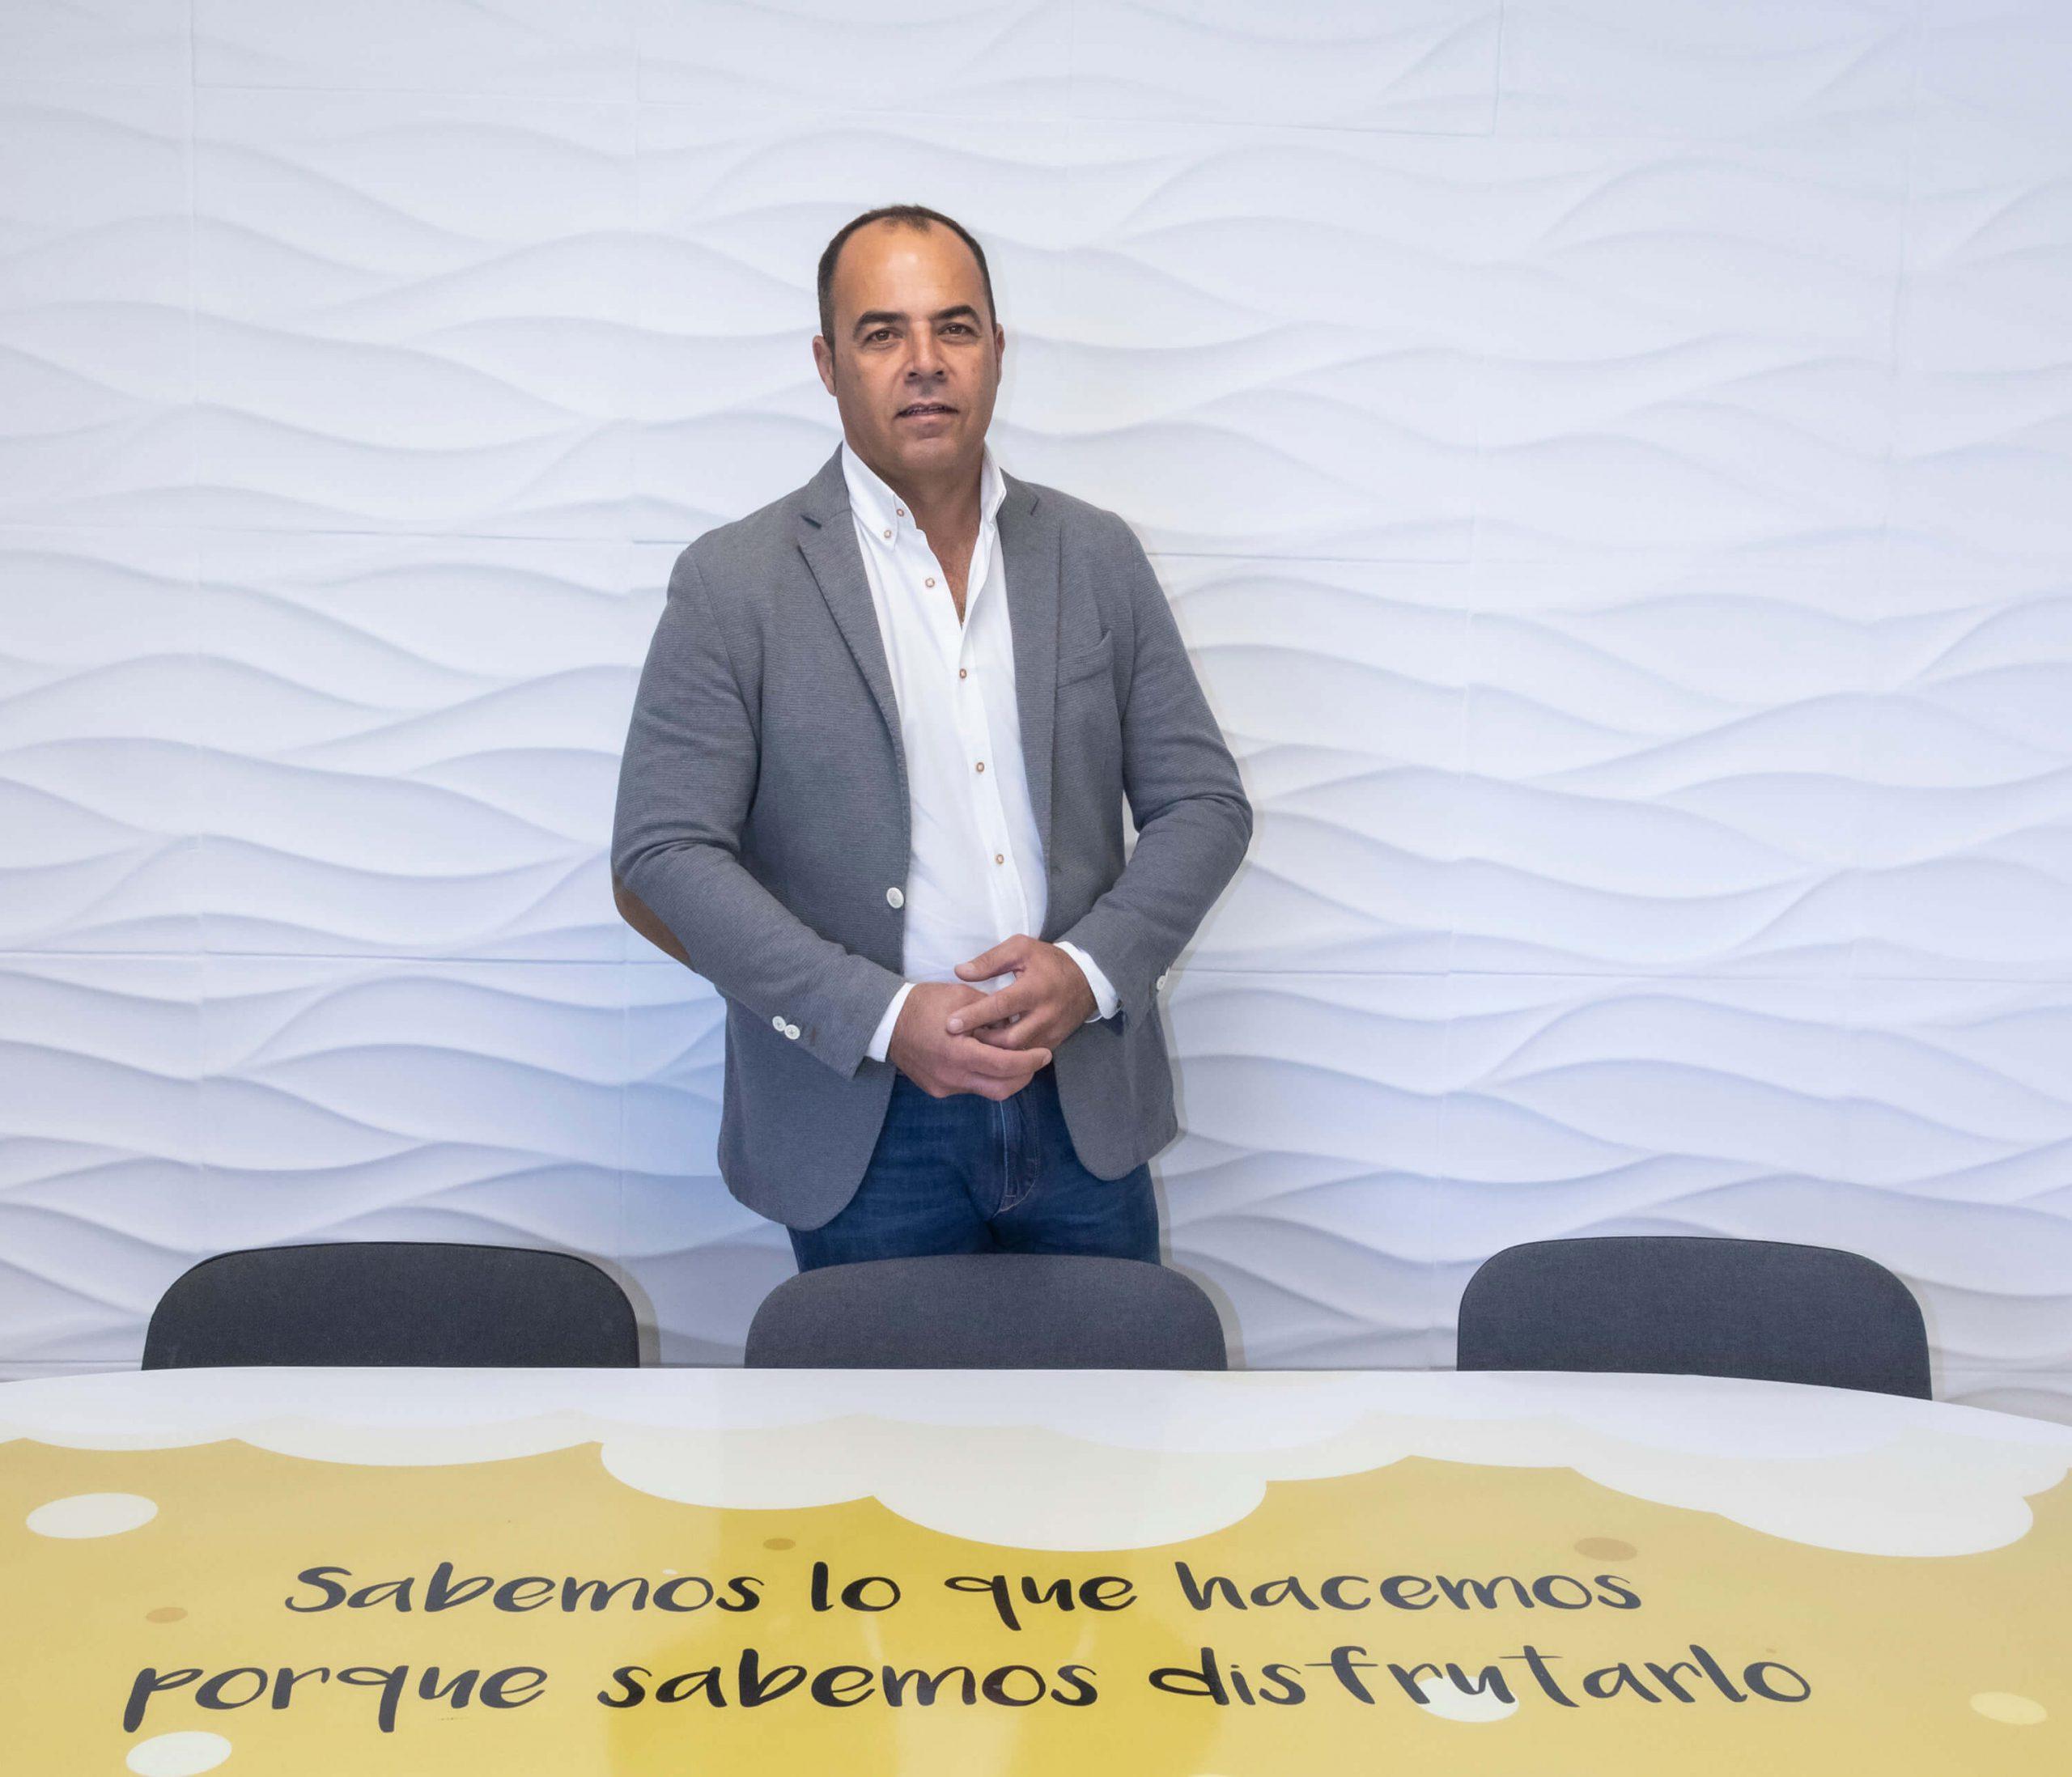 Jesús D. Méndez Mederos Gerente de Ospaen Servis